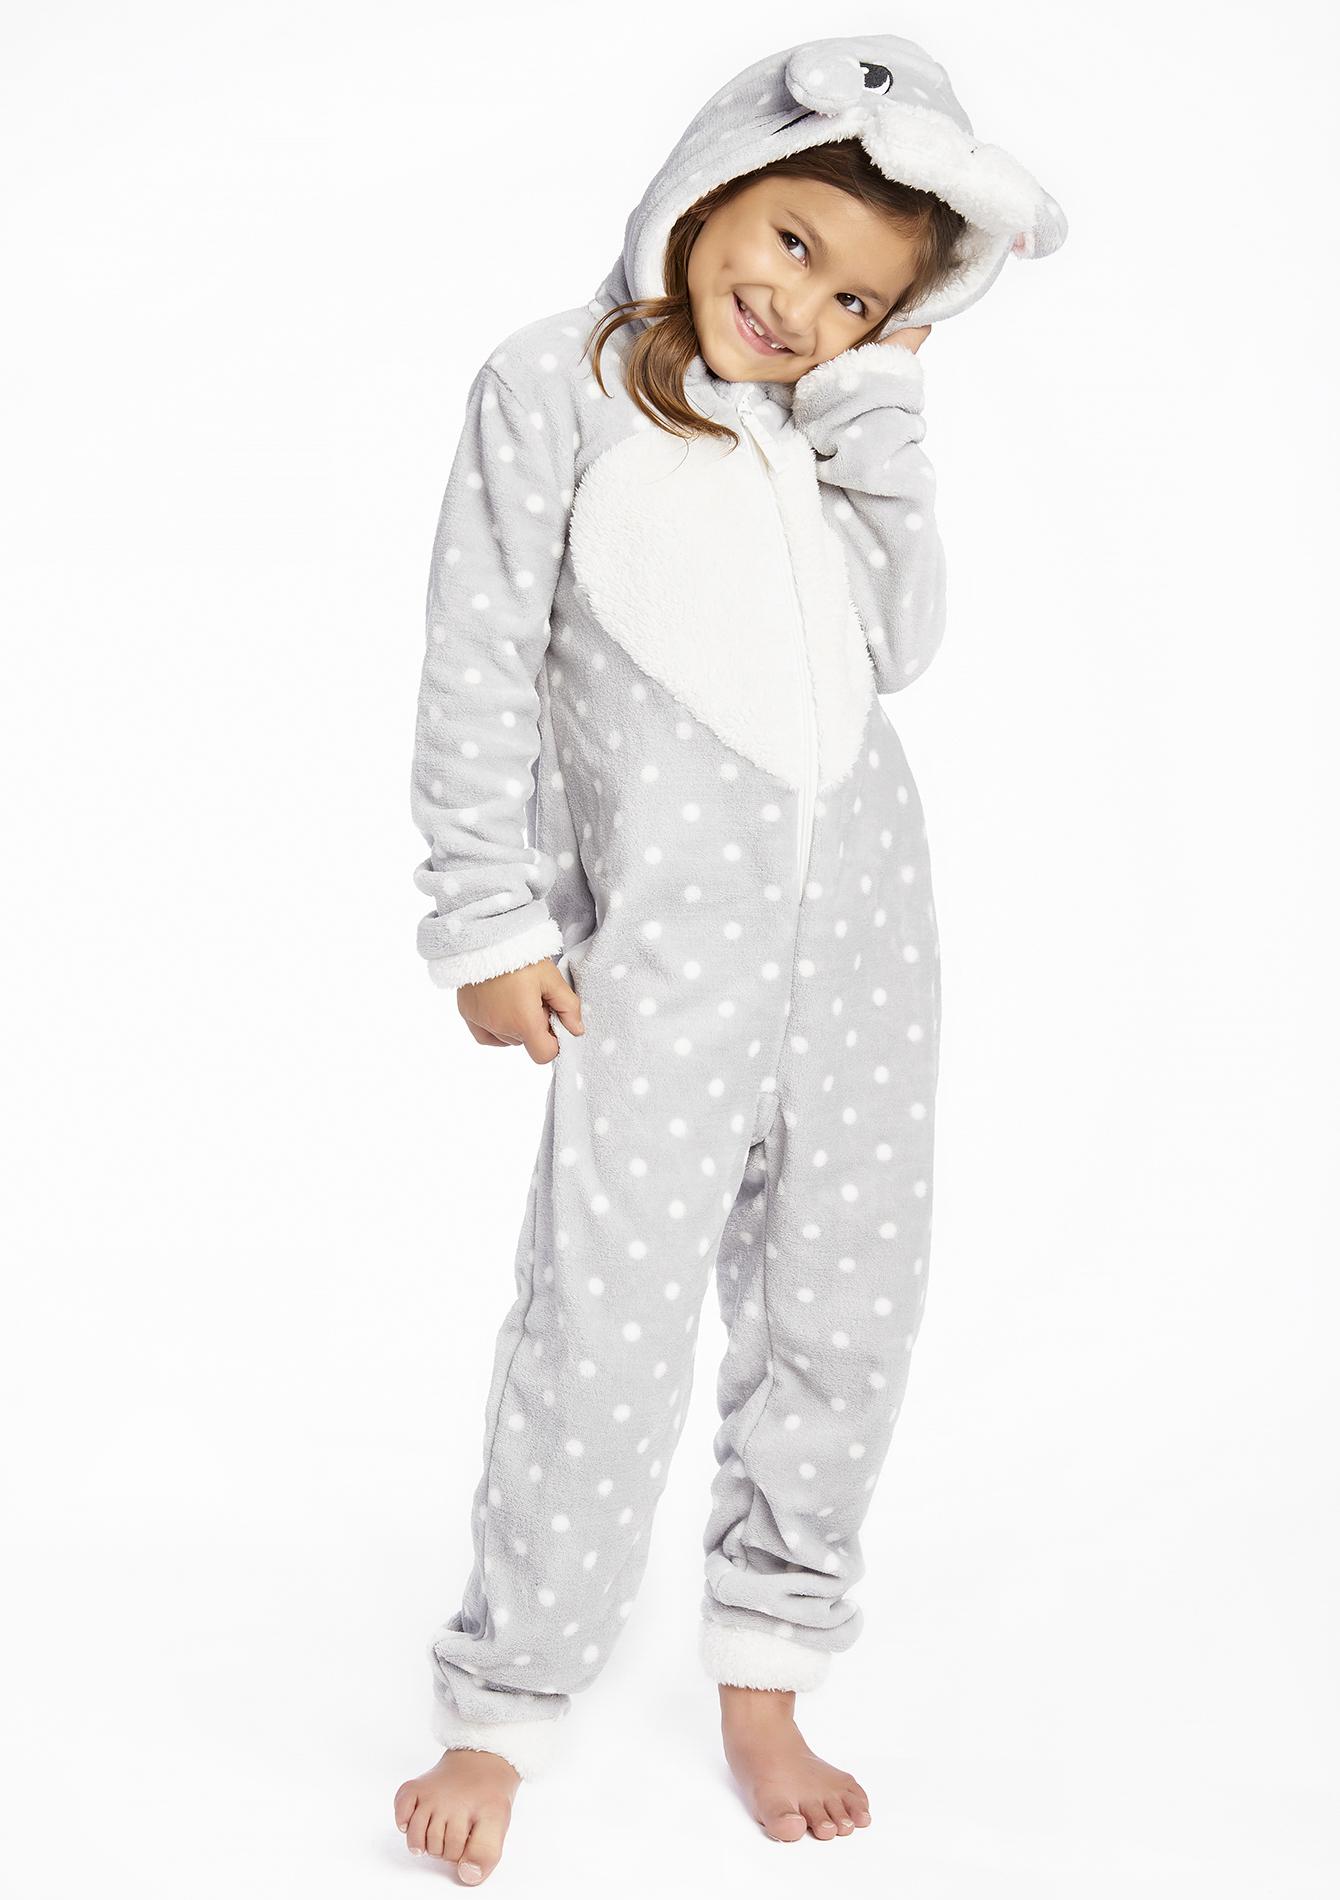 combinaison pyjama enfant style lapin lolaliza. Black Bedroom Furniture Sets. Home Design Ideas